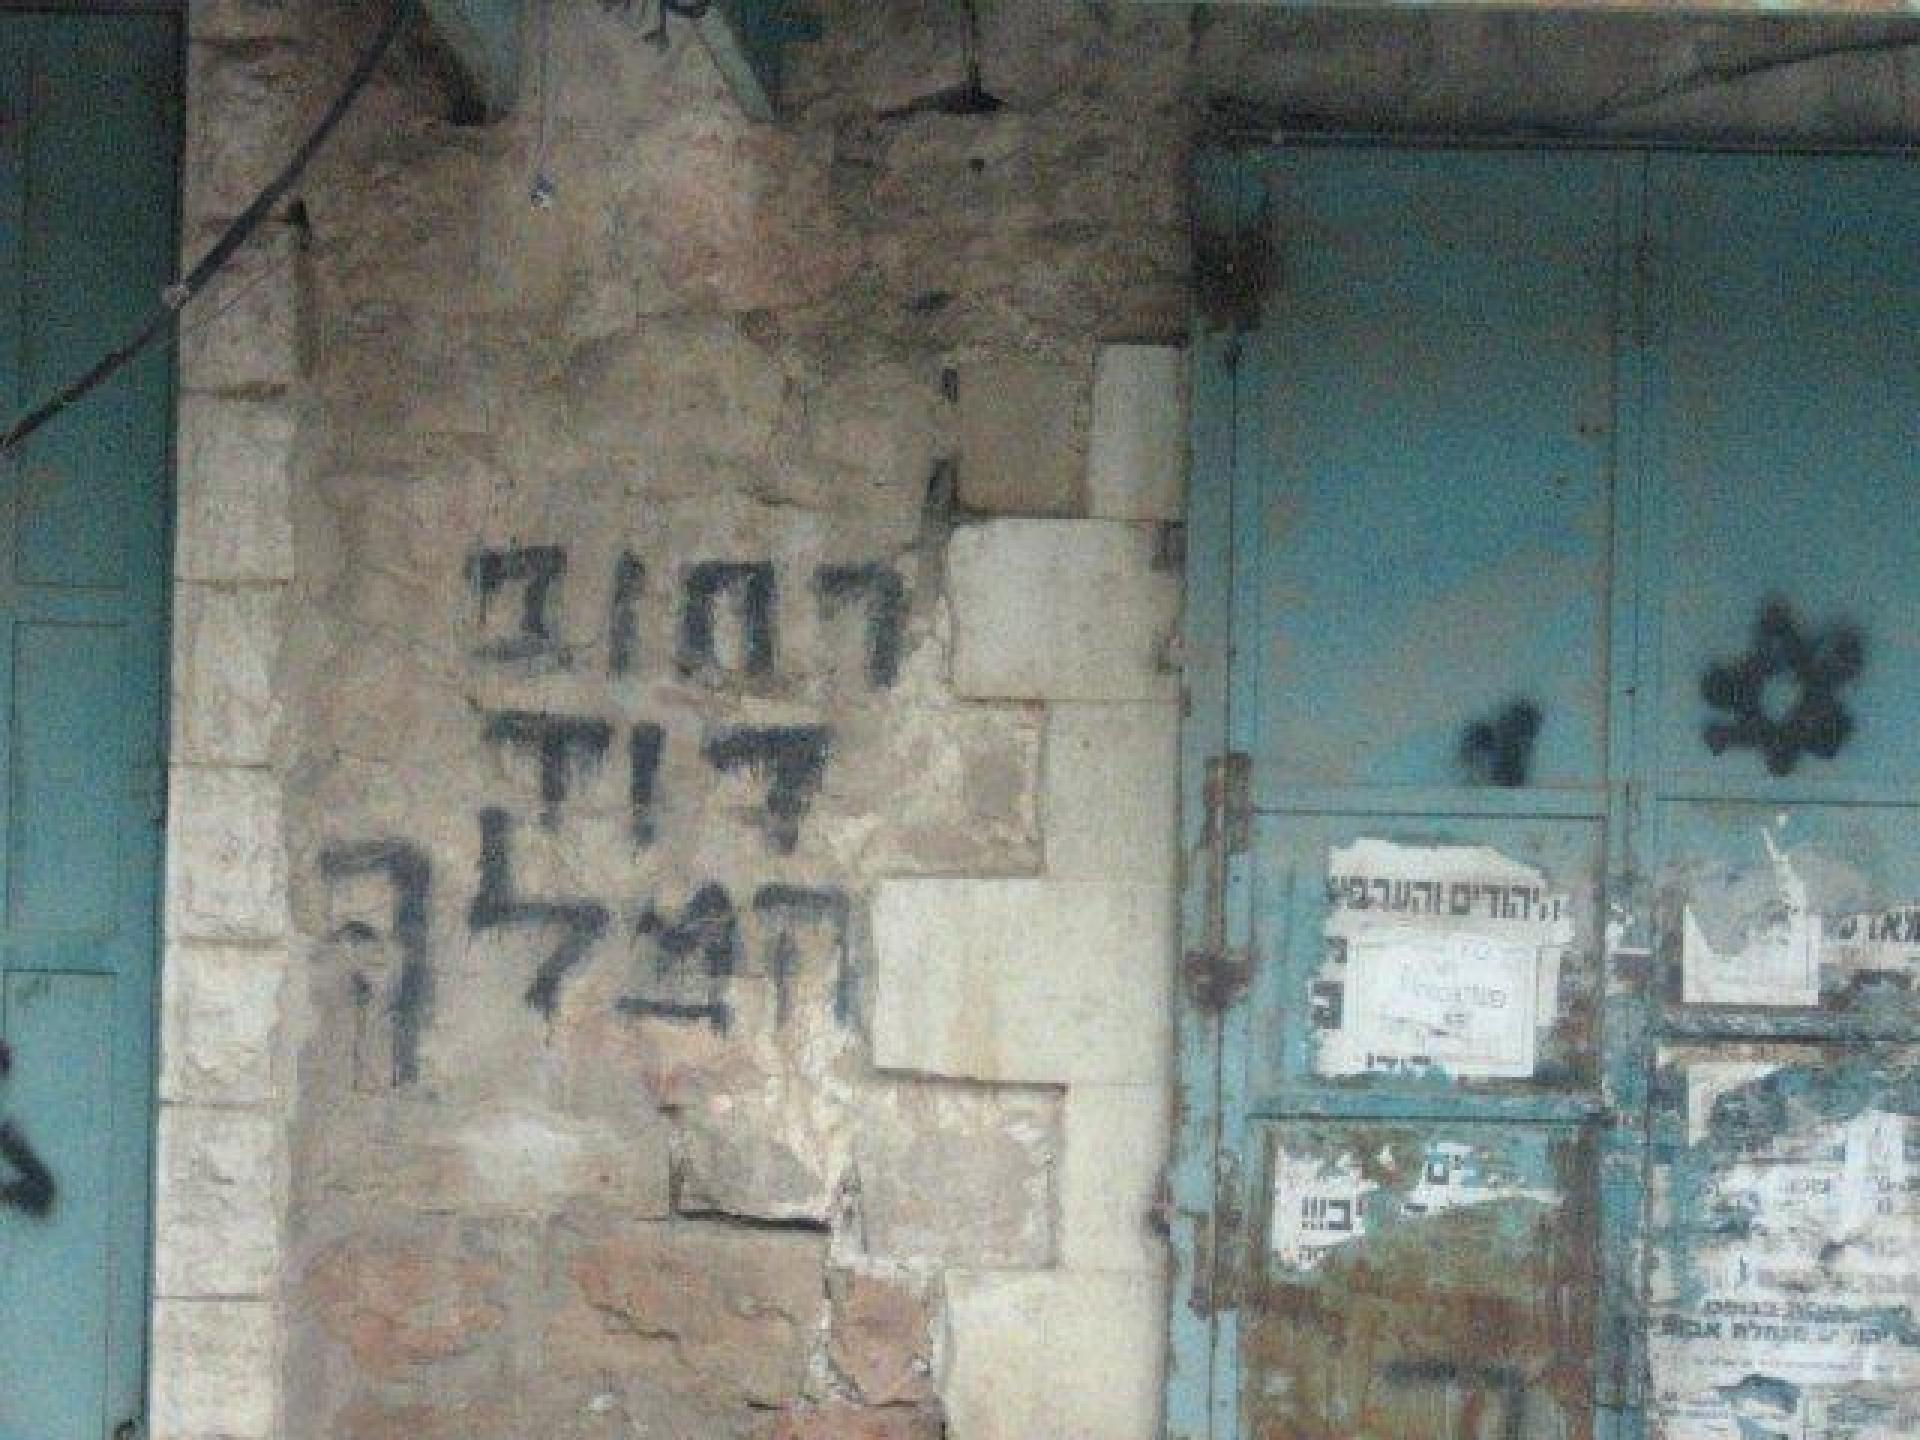 Hebron 03.05.11